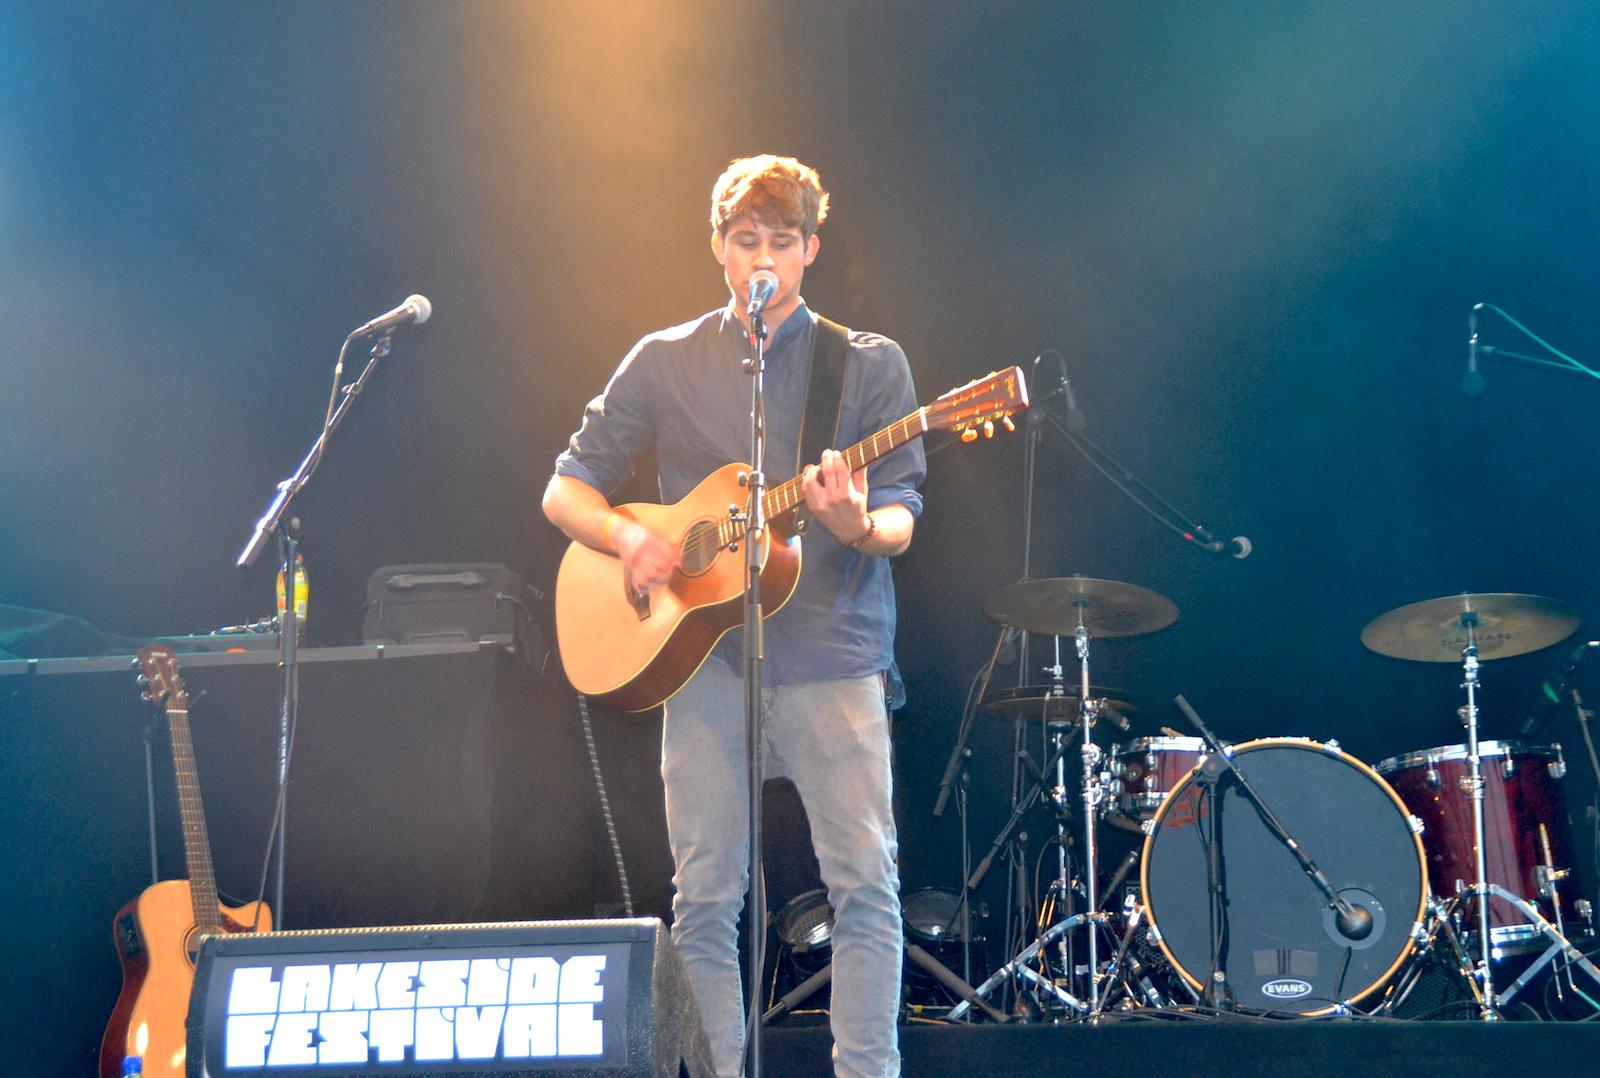 Damian Lynn bei seinem Konzert am Lakeside Festival. (Bild: jav)